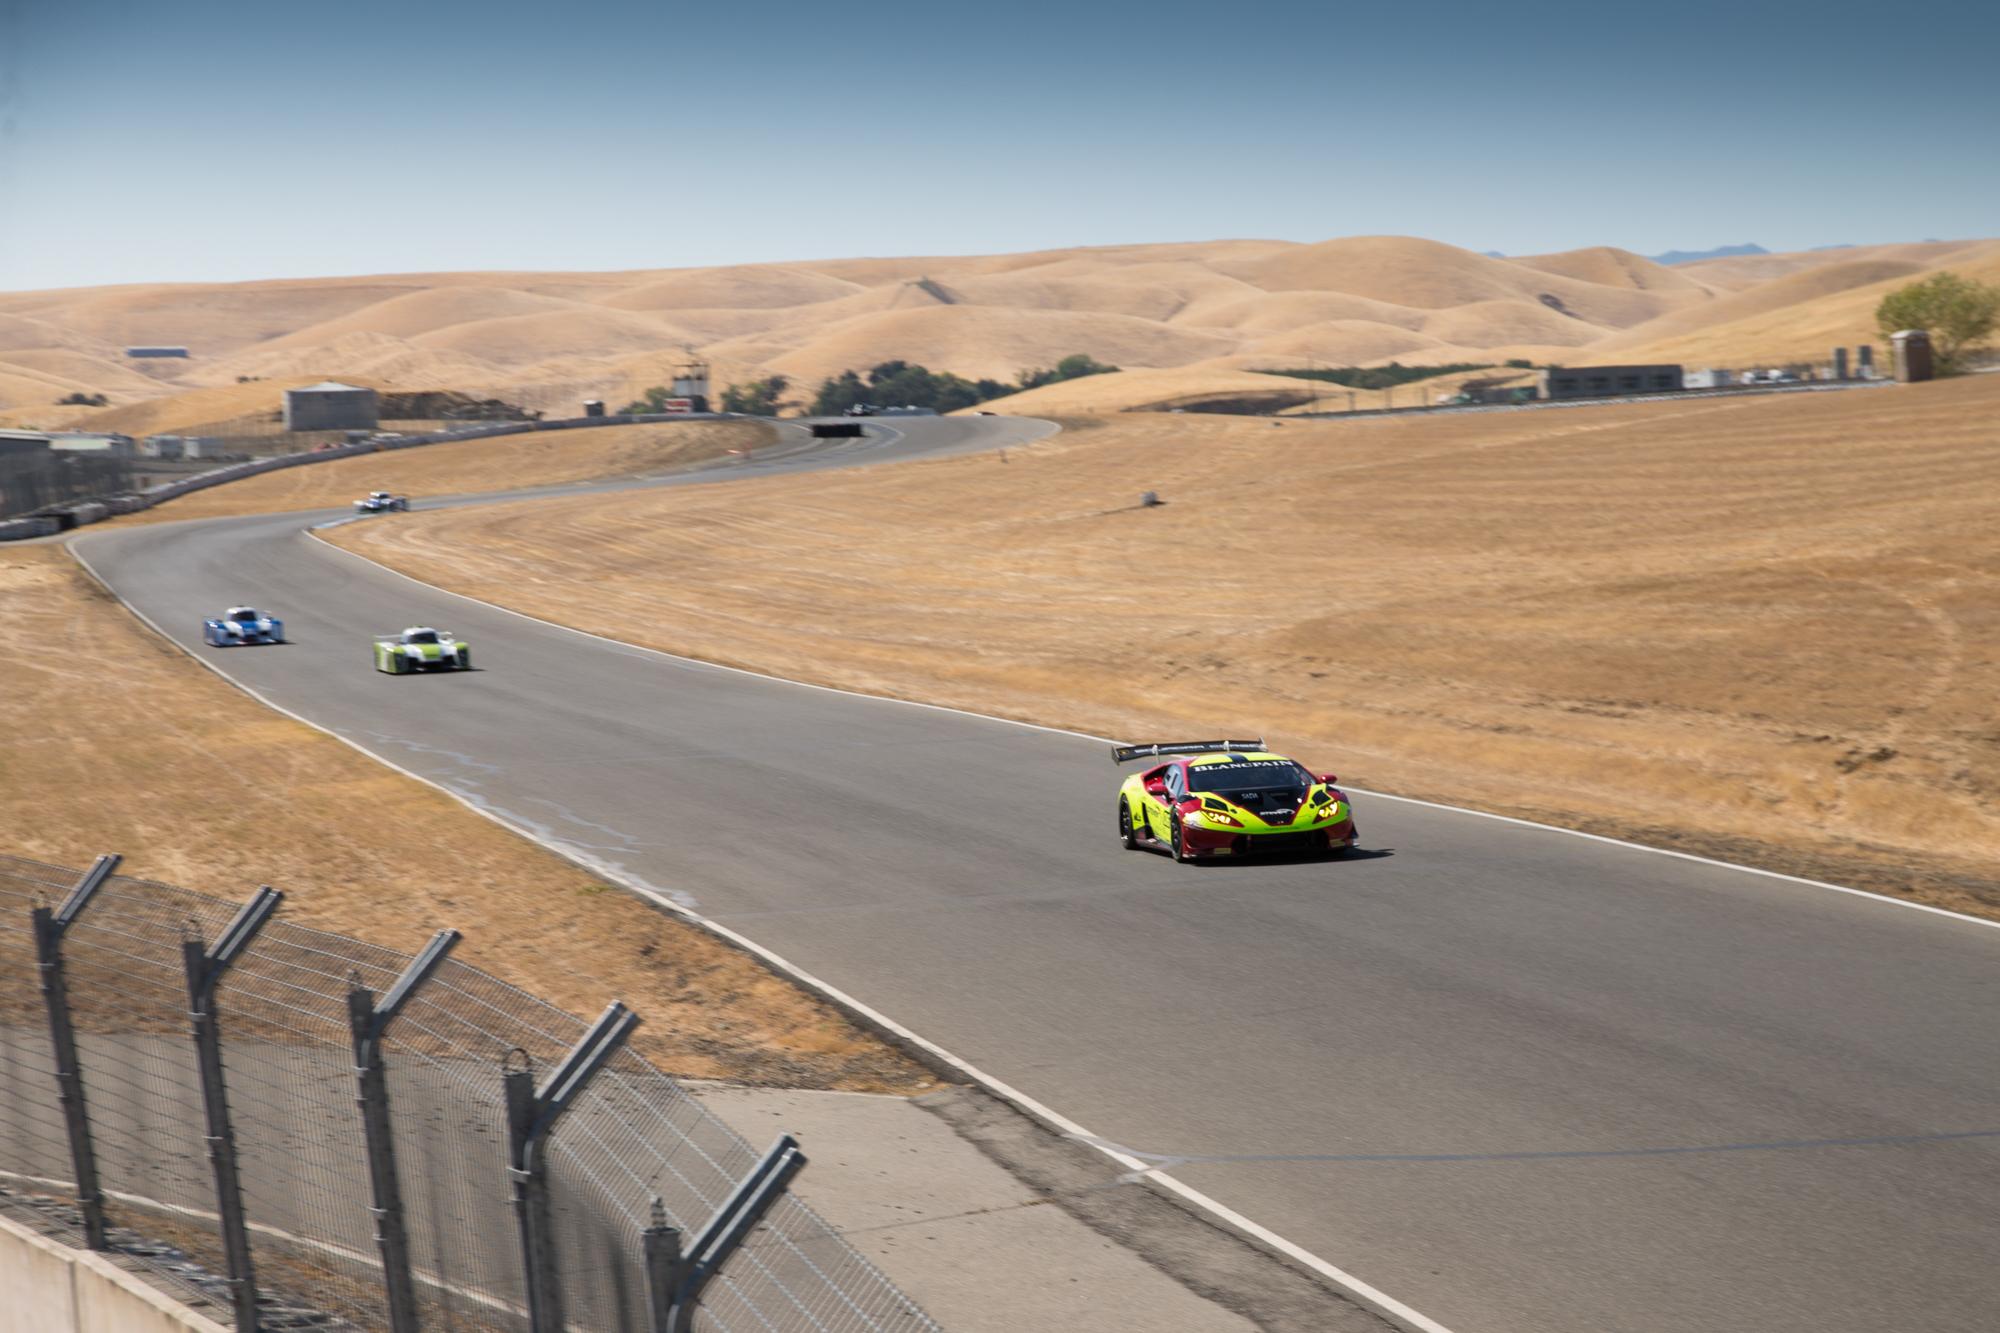 Steven-Racing-20171006-45000.jpg